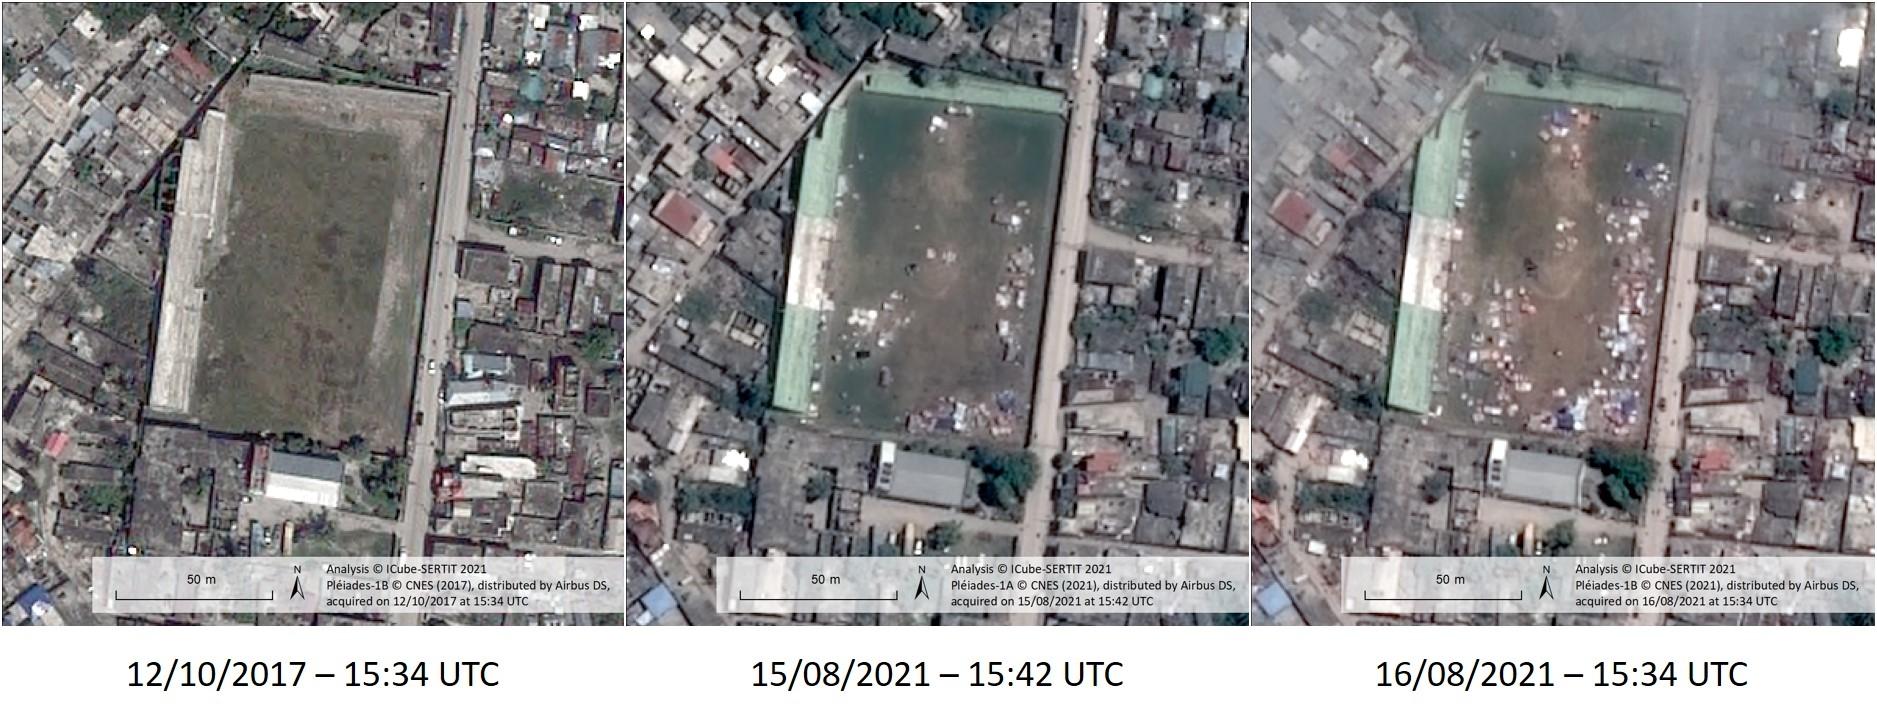 is_charte-haiti-082021-3vues.jpg